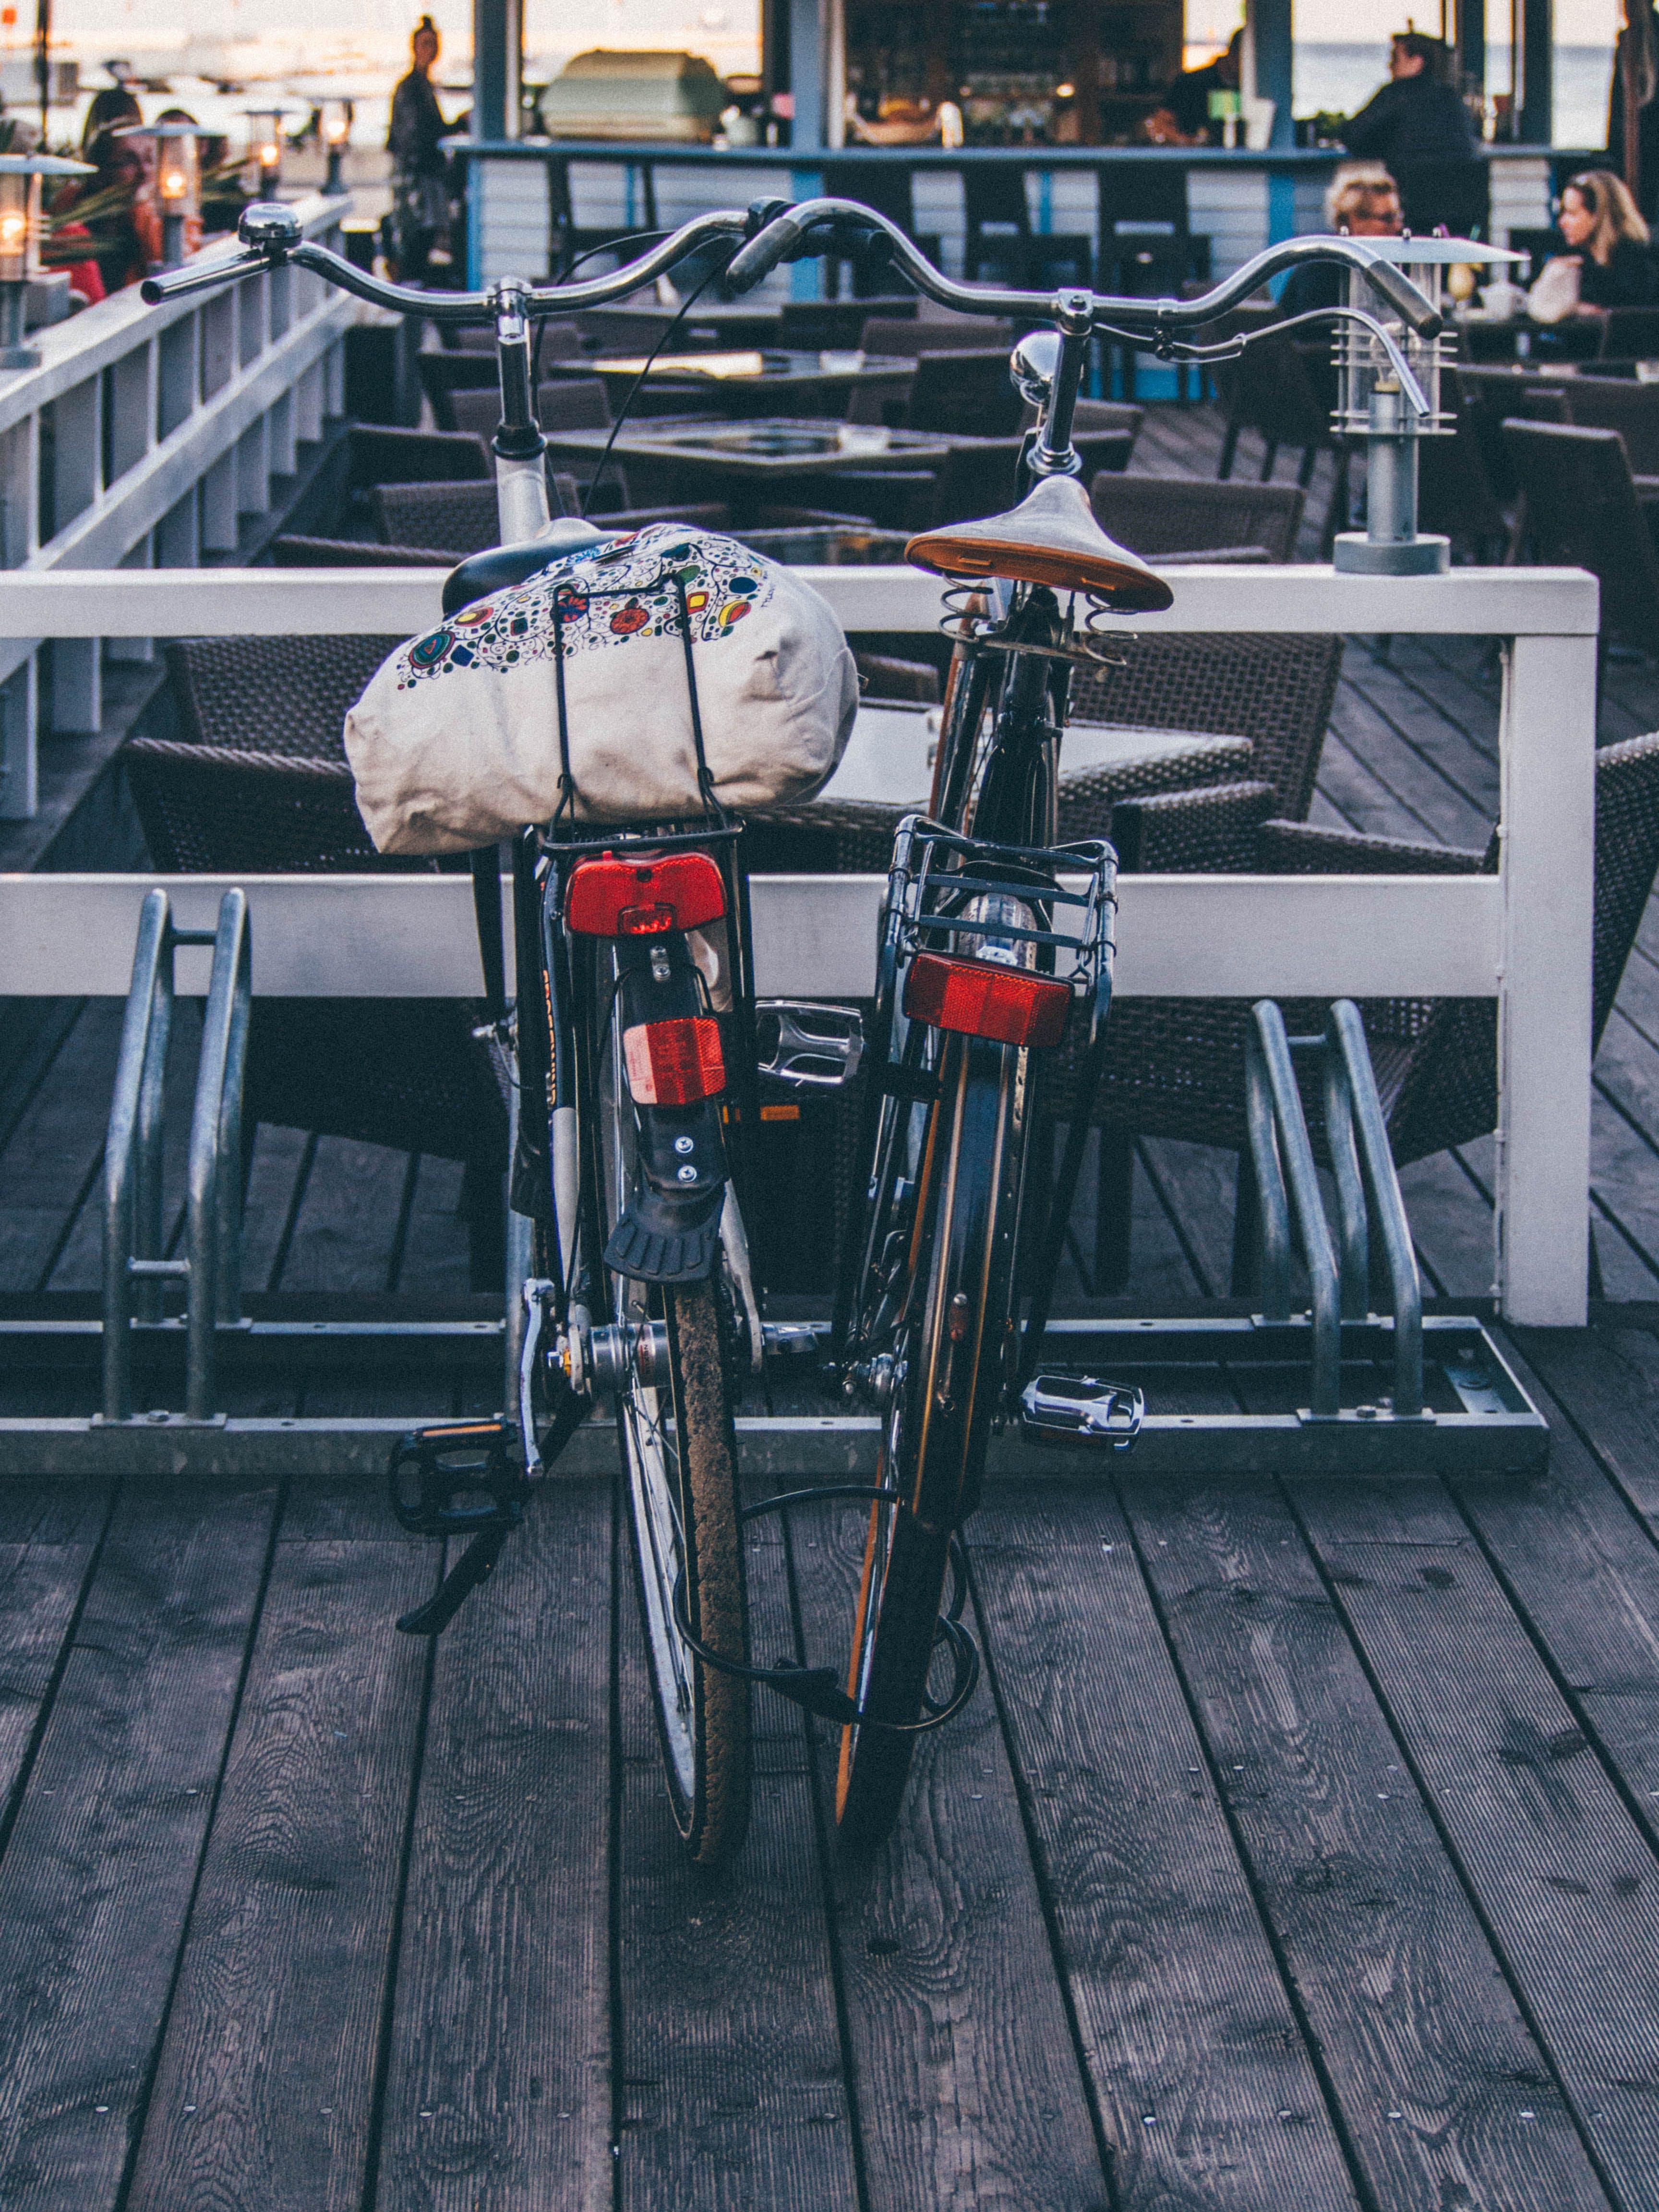 bar, bicycles, bikes